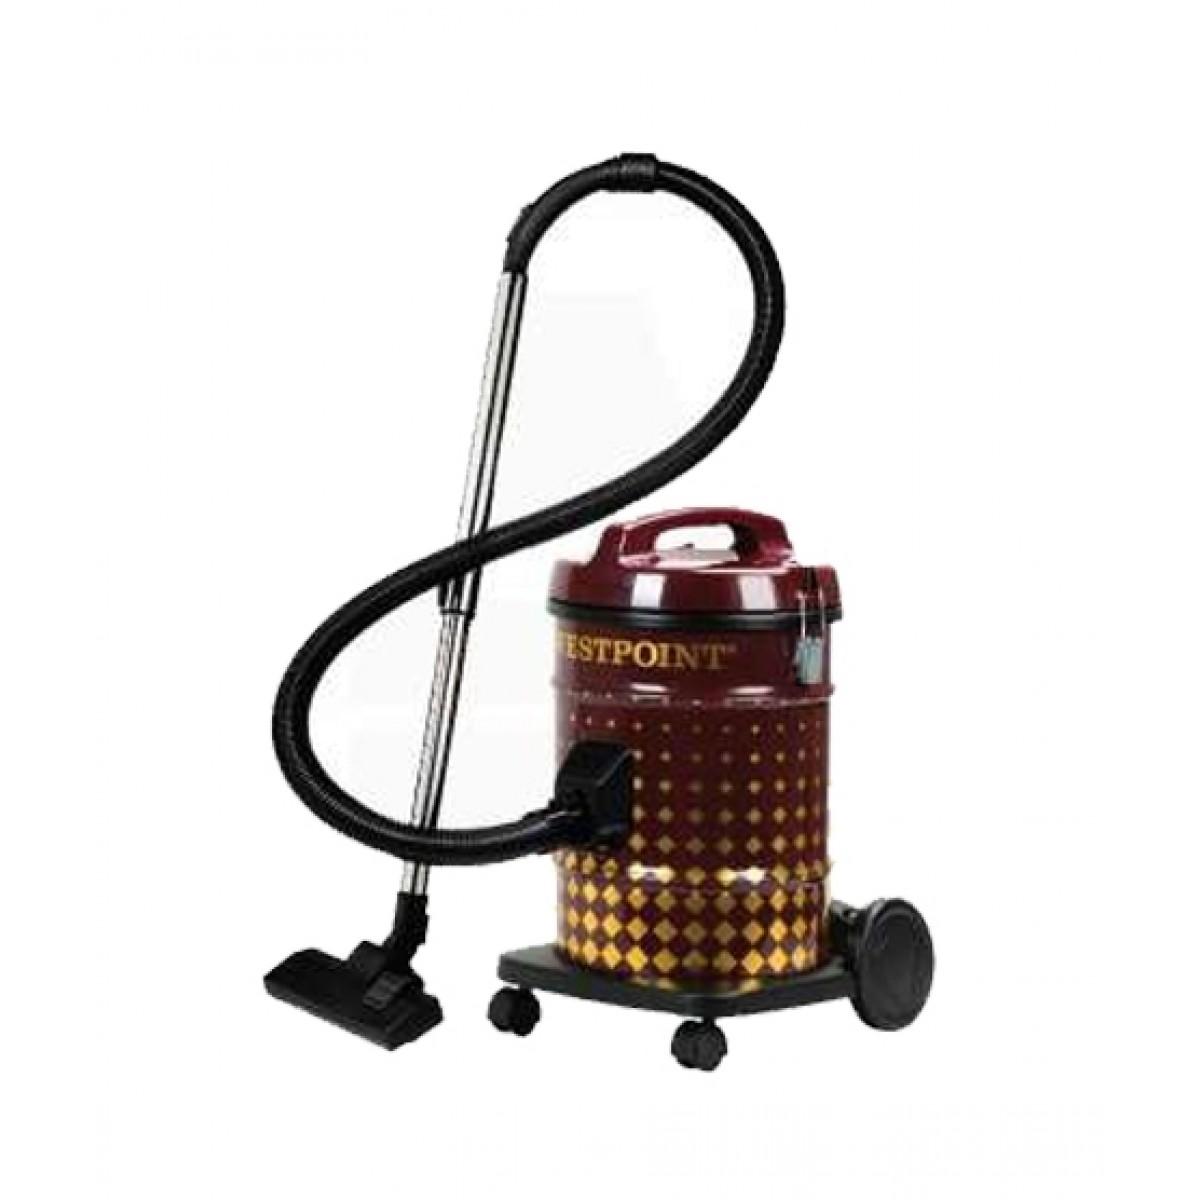 Westpoint Drum Vacuum Cleaner (WF-102)